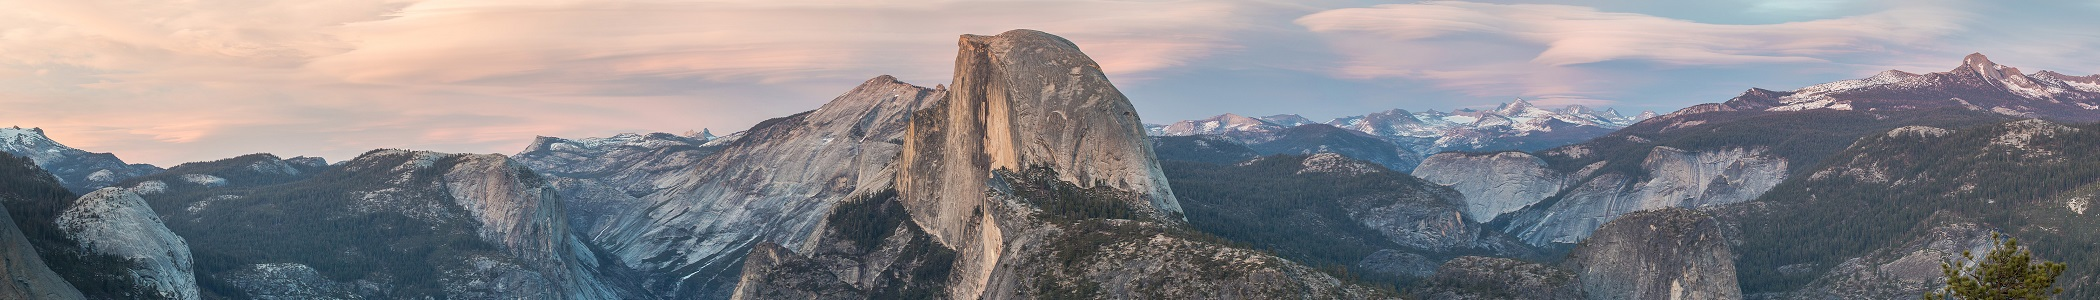 Yosemite Travel Guide Pdf